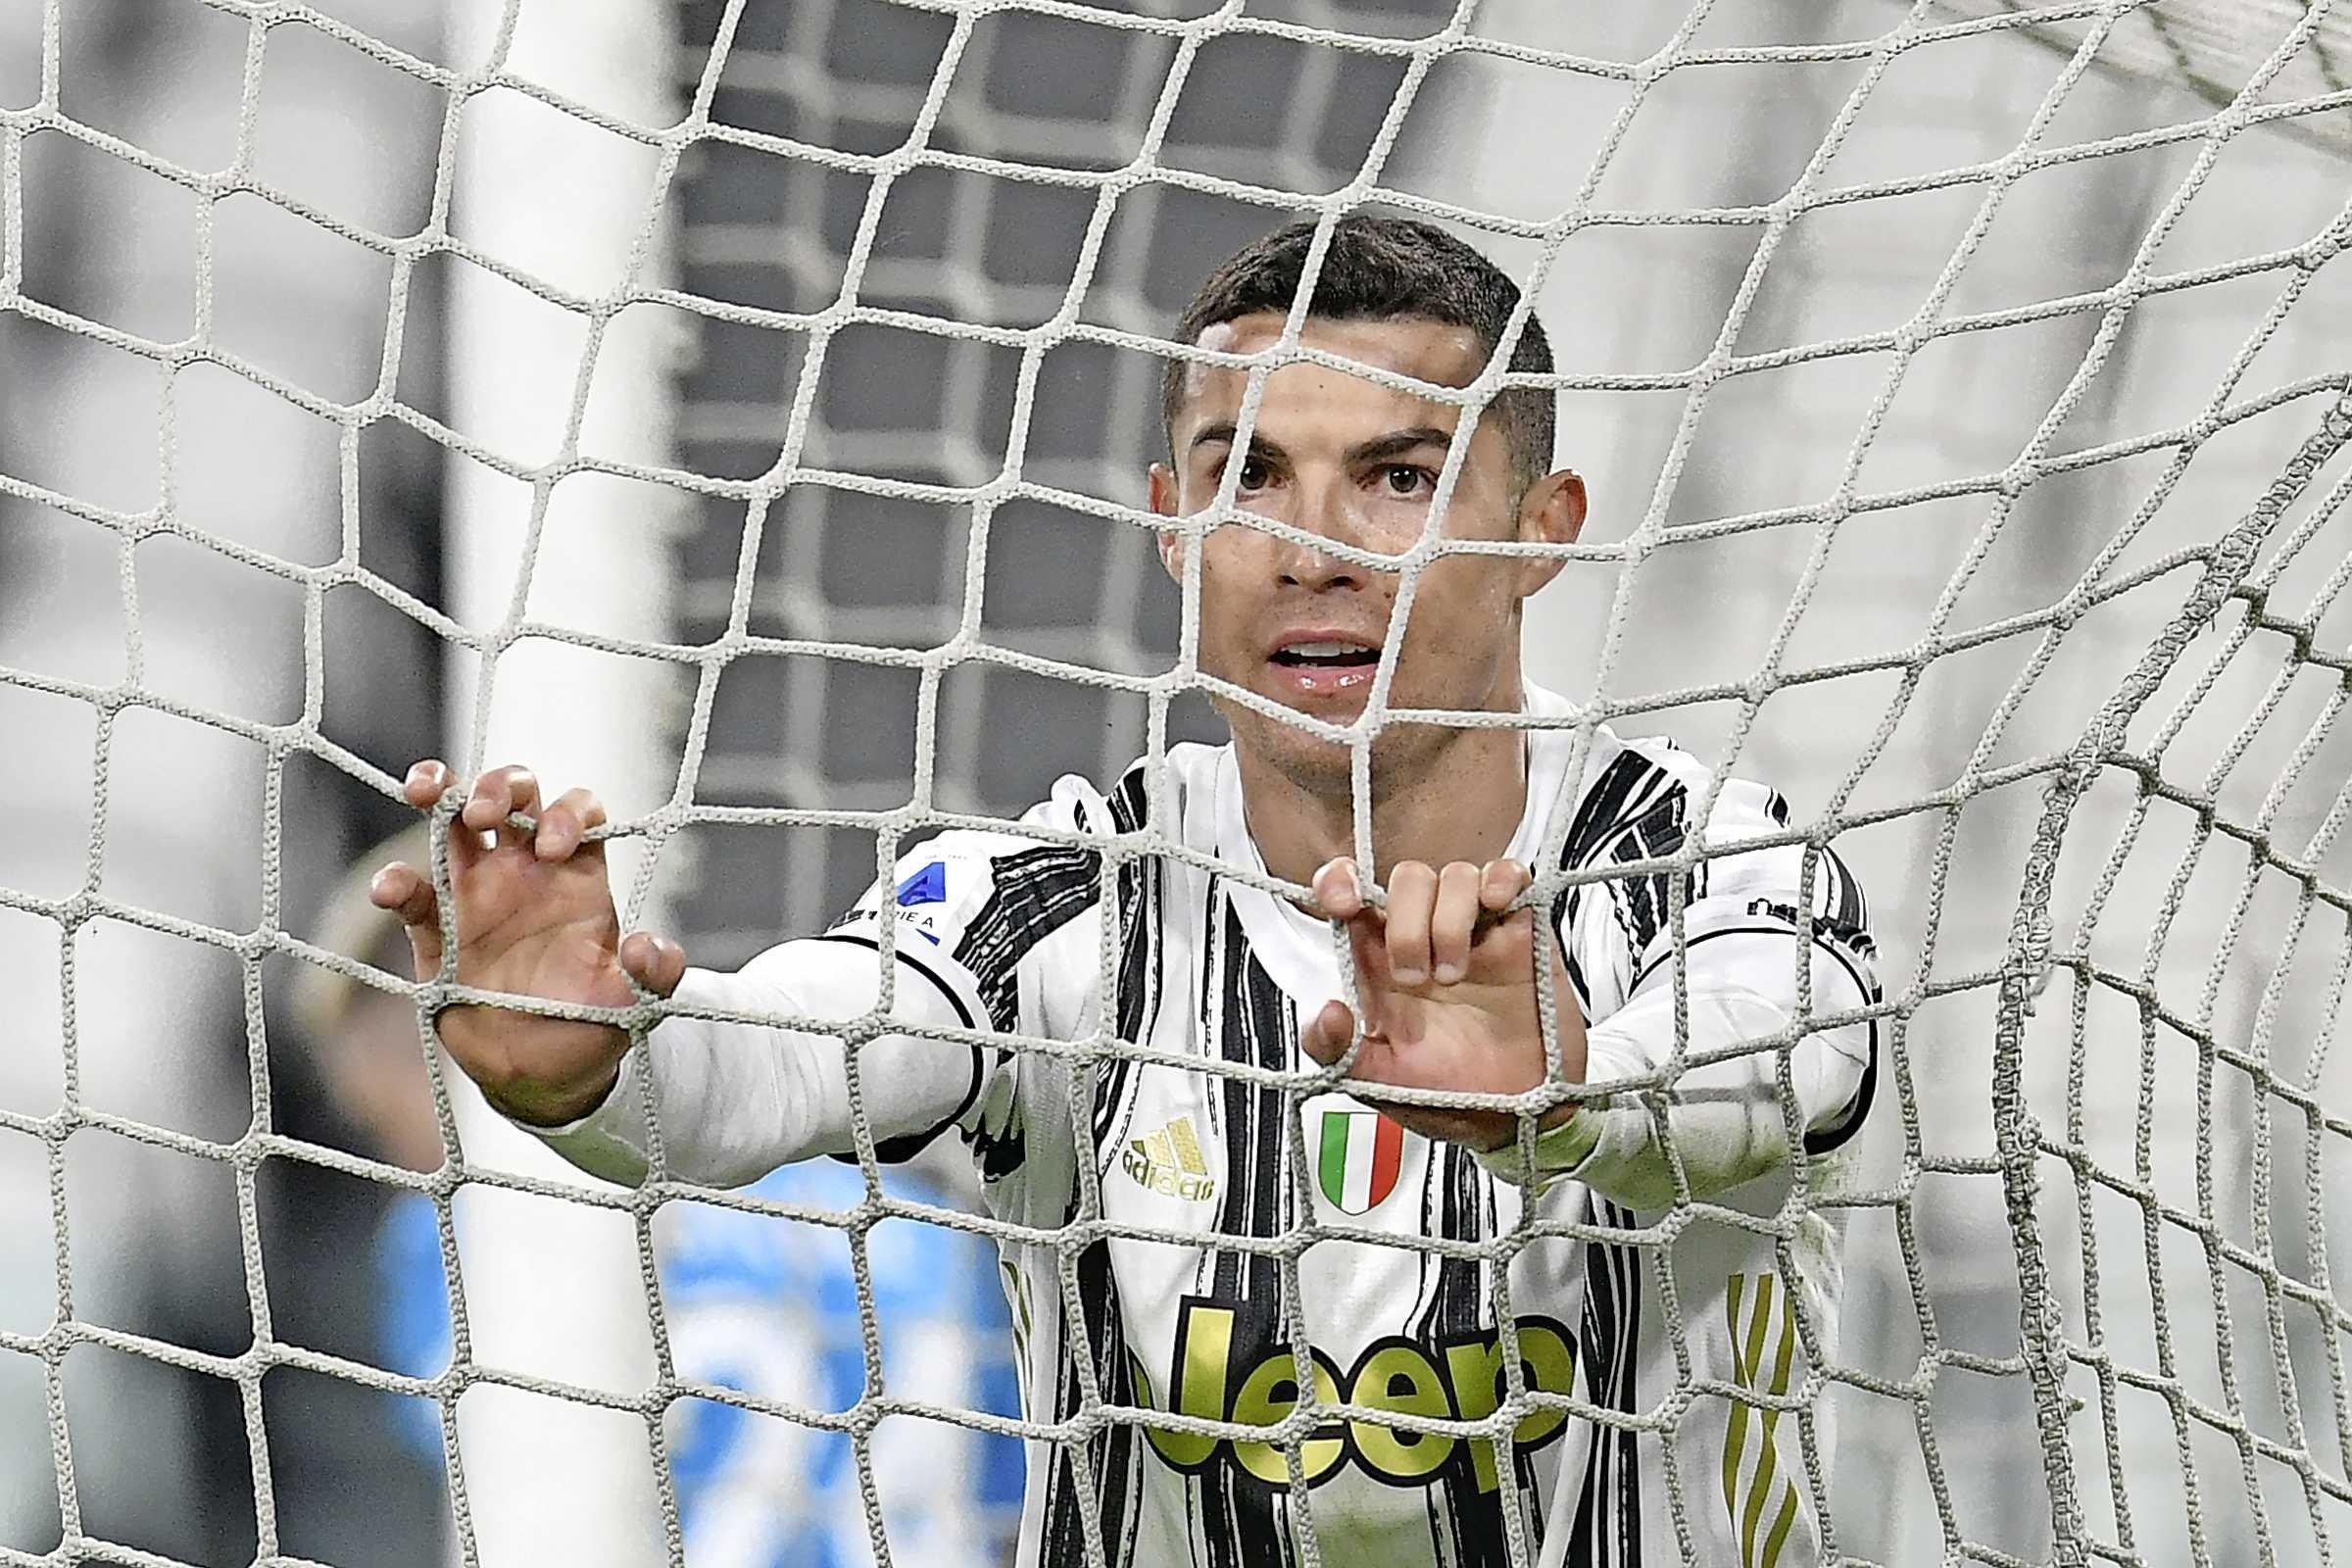 Cristiano Ronaldo (36) bereikt wéér magische grens na treffer | Voetbal |  Telegraaf.nl